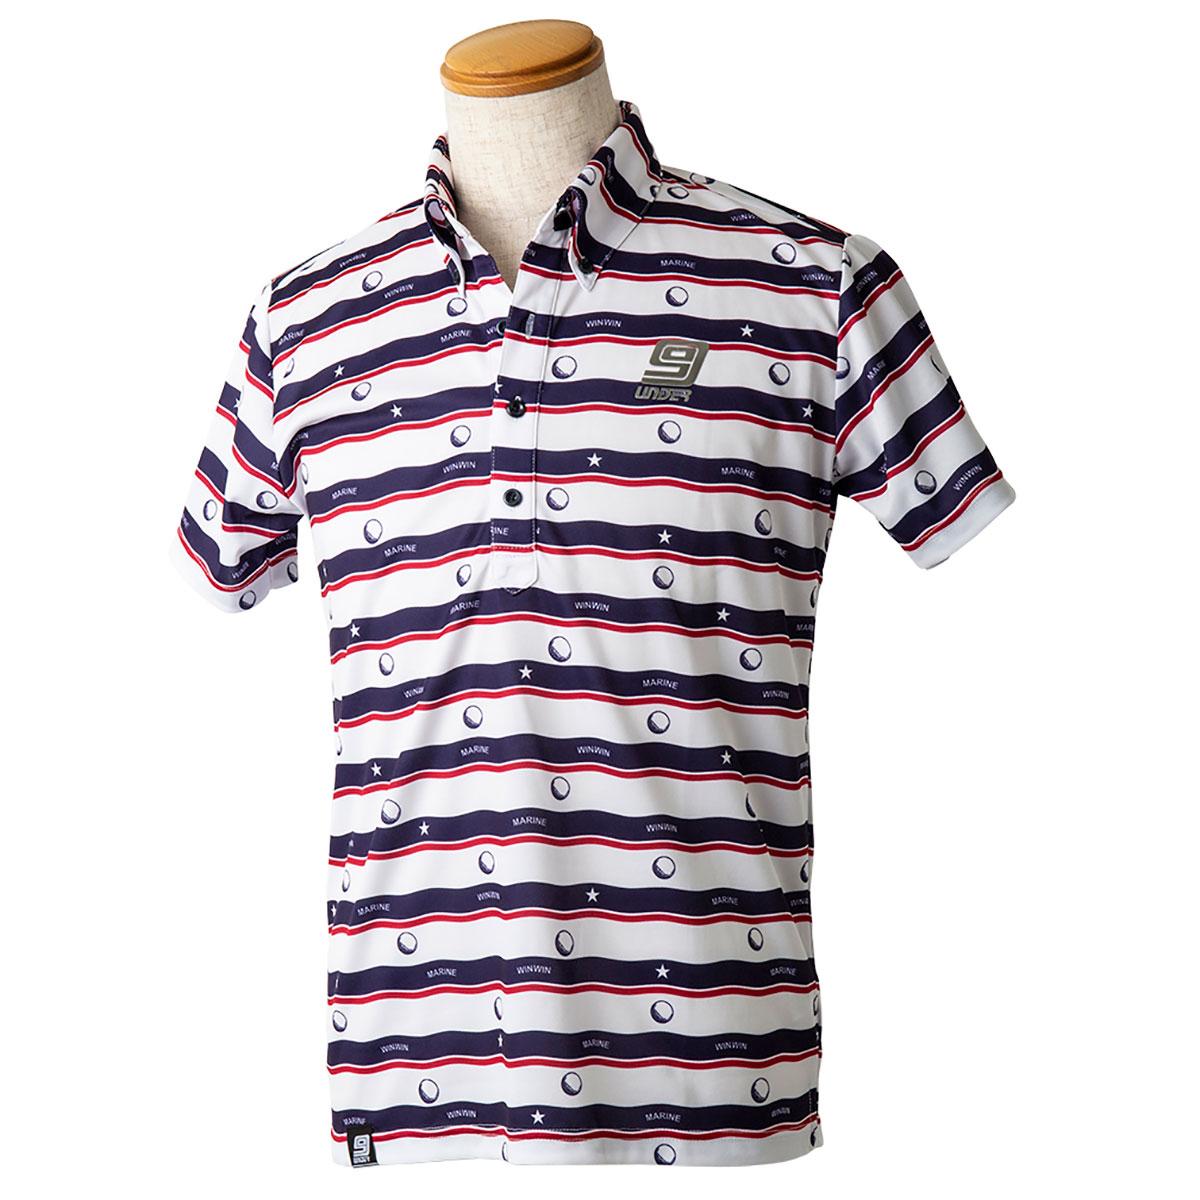 WINWIN MARINE 半袖ポロシャツ